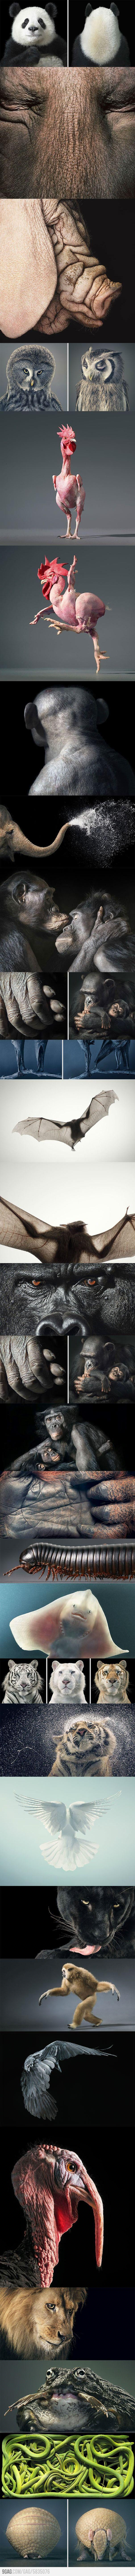 Mooie dierenplaatjes